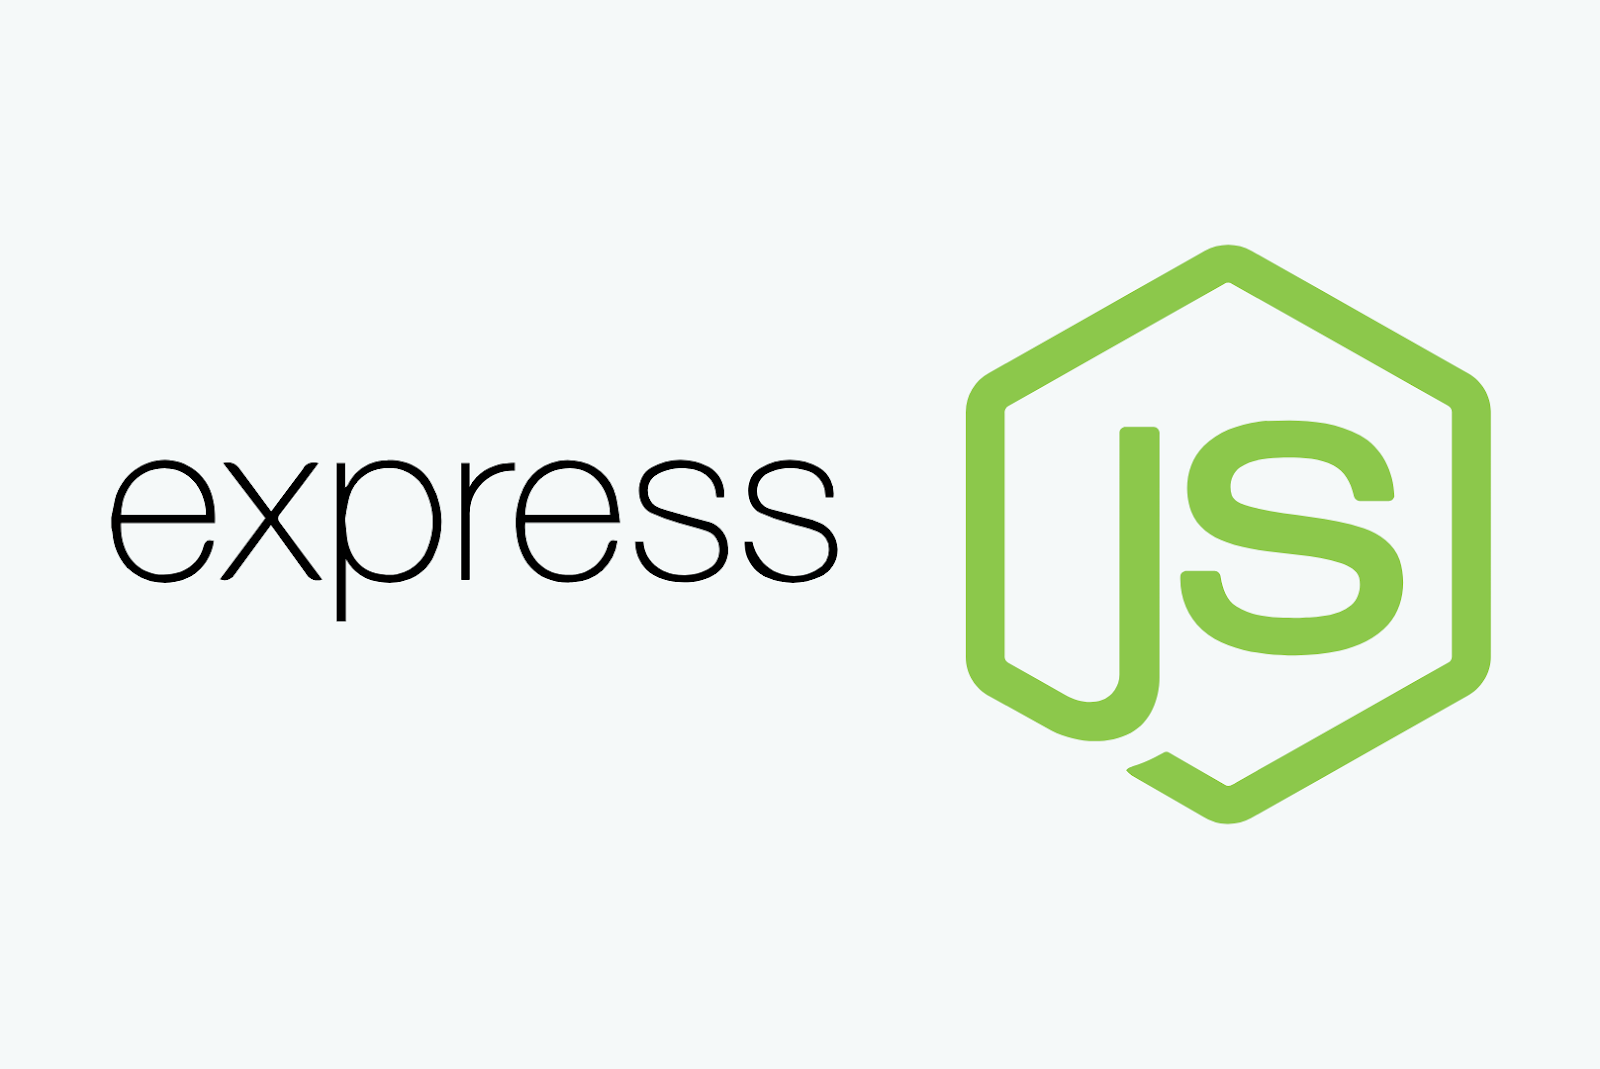 Express.js for JavaScript applications development